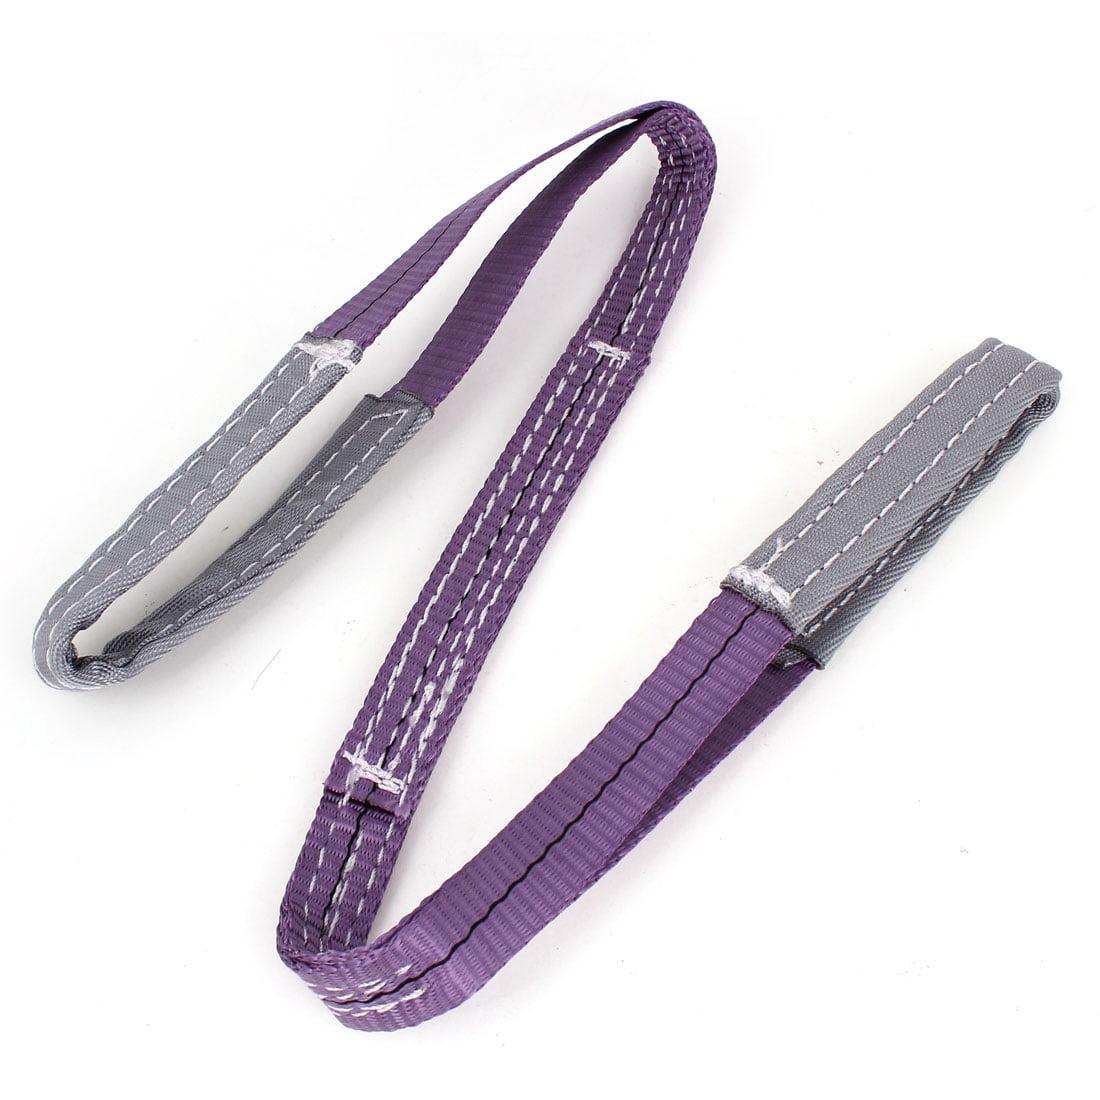 Unique Bargains Purple Gray Eye to Eye Flat Webbing Web Lifting Strap 3.3ft Length 2.5cm Wide